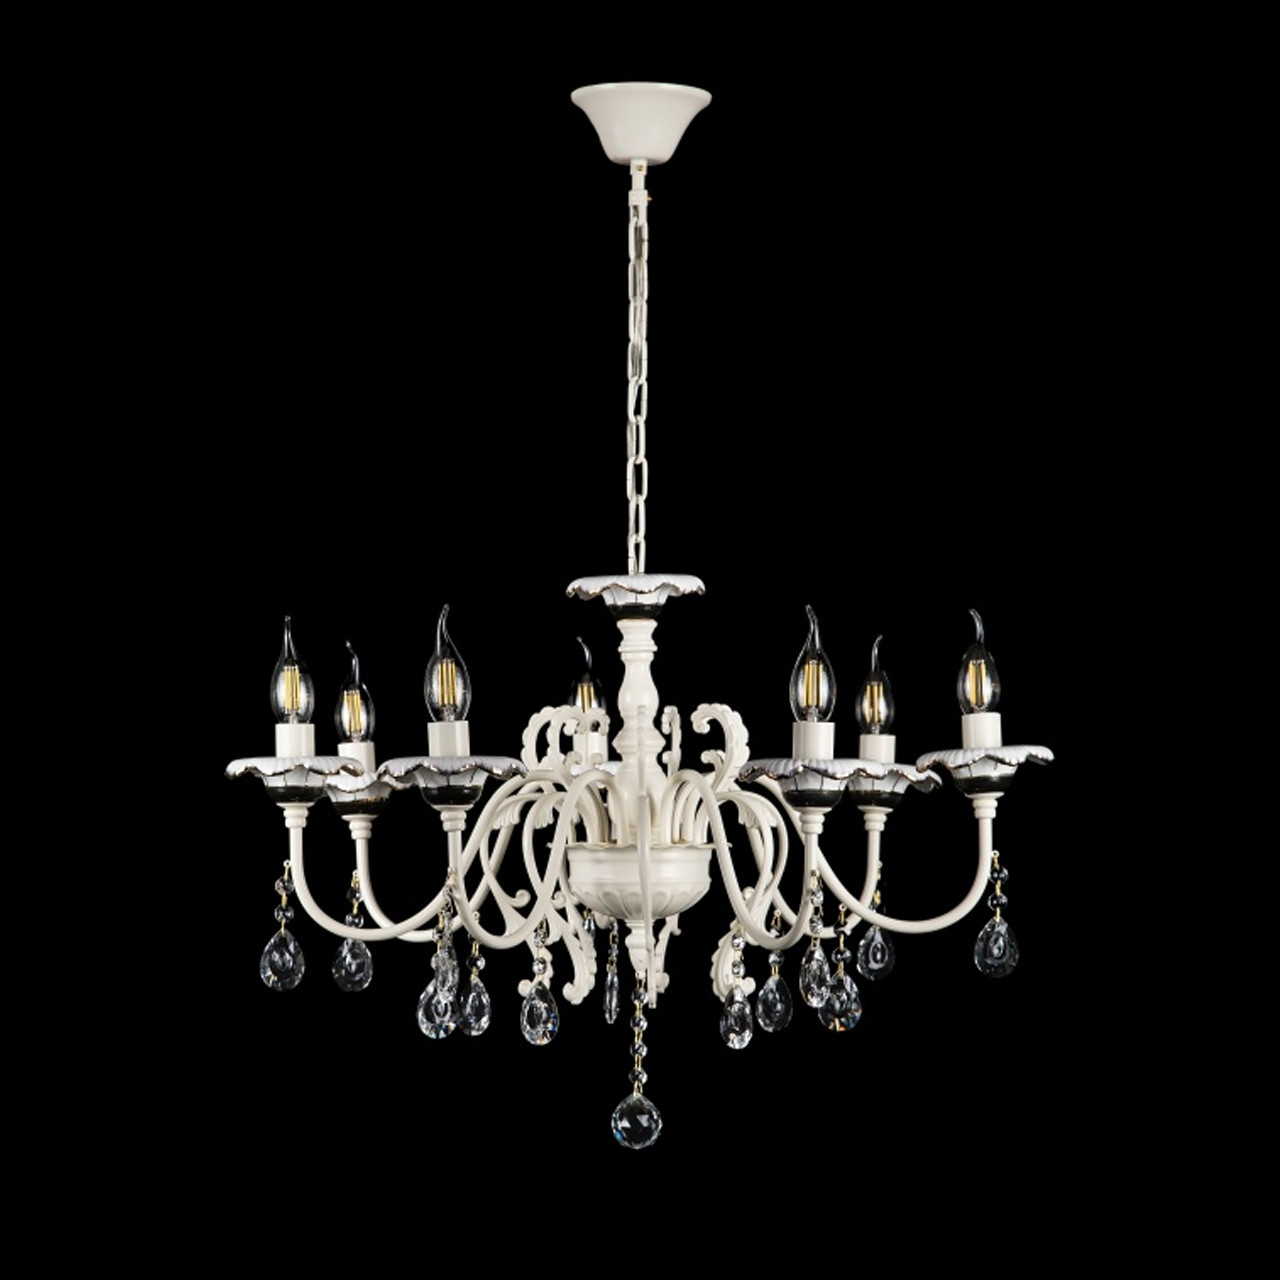 Люстра-свеча на 7 лампочек белый каркас СветМира VL-L30853B/7 (YH MJ)